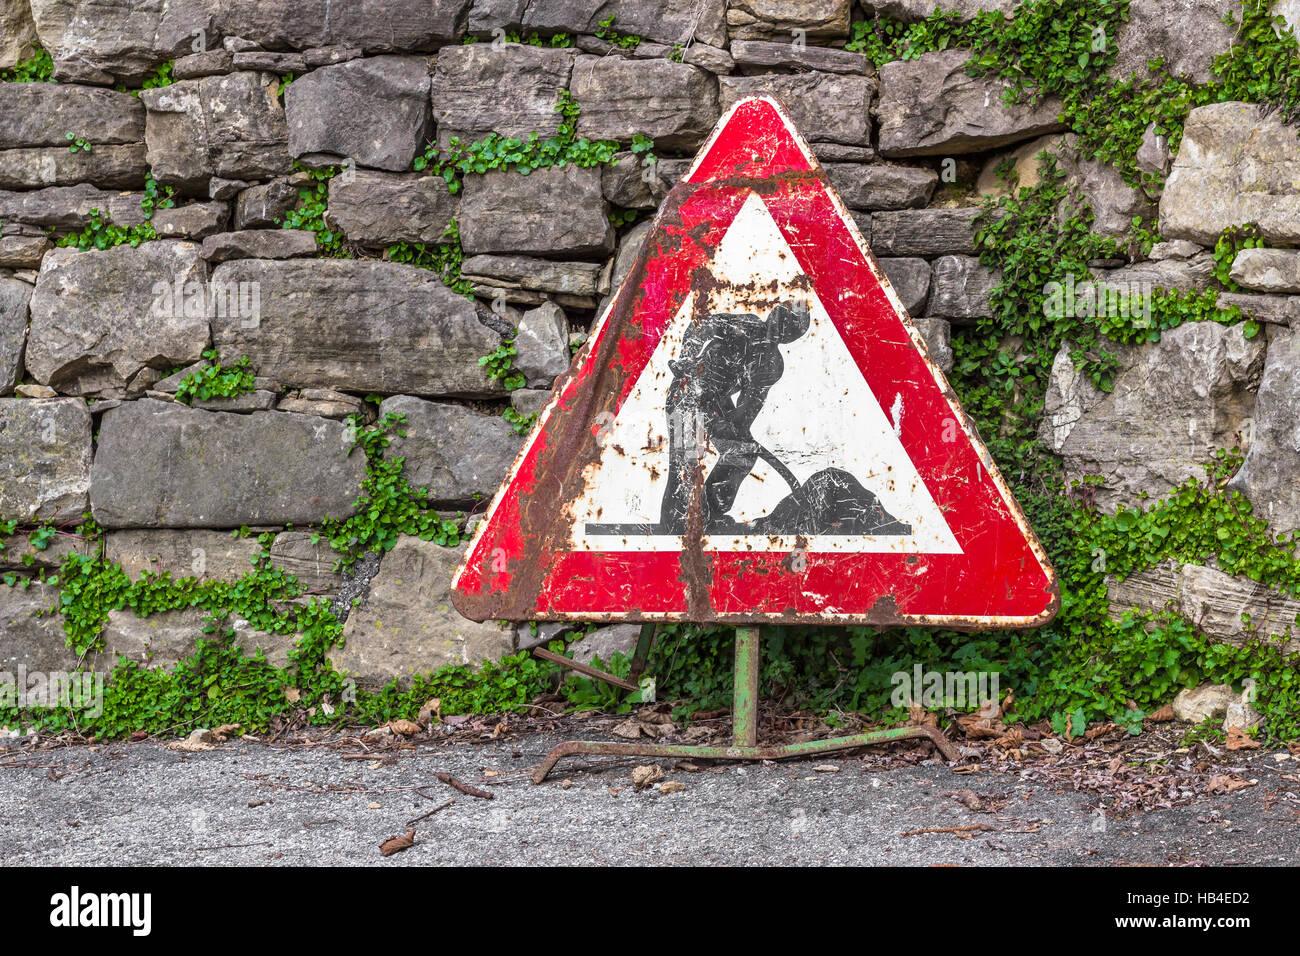 Work in progress road sign - Stock Image